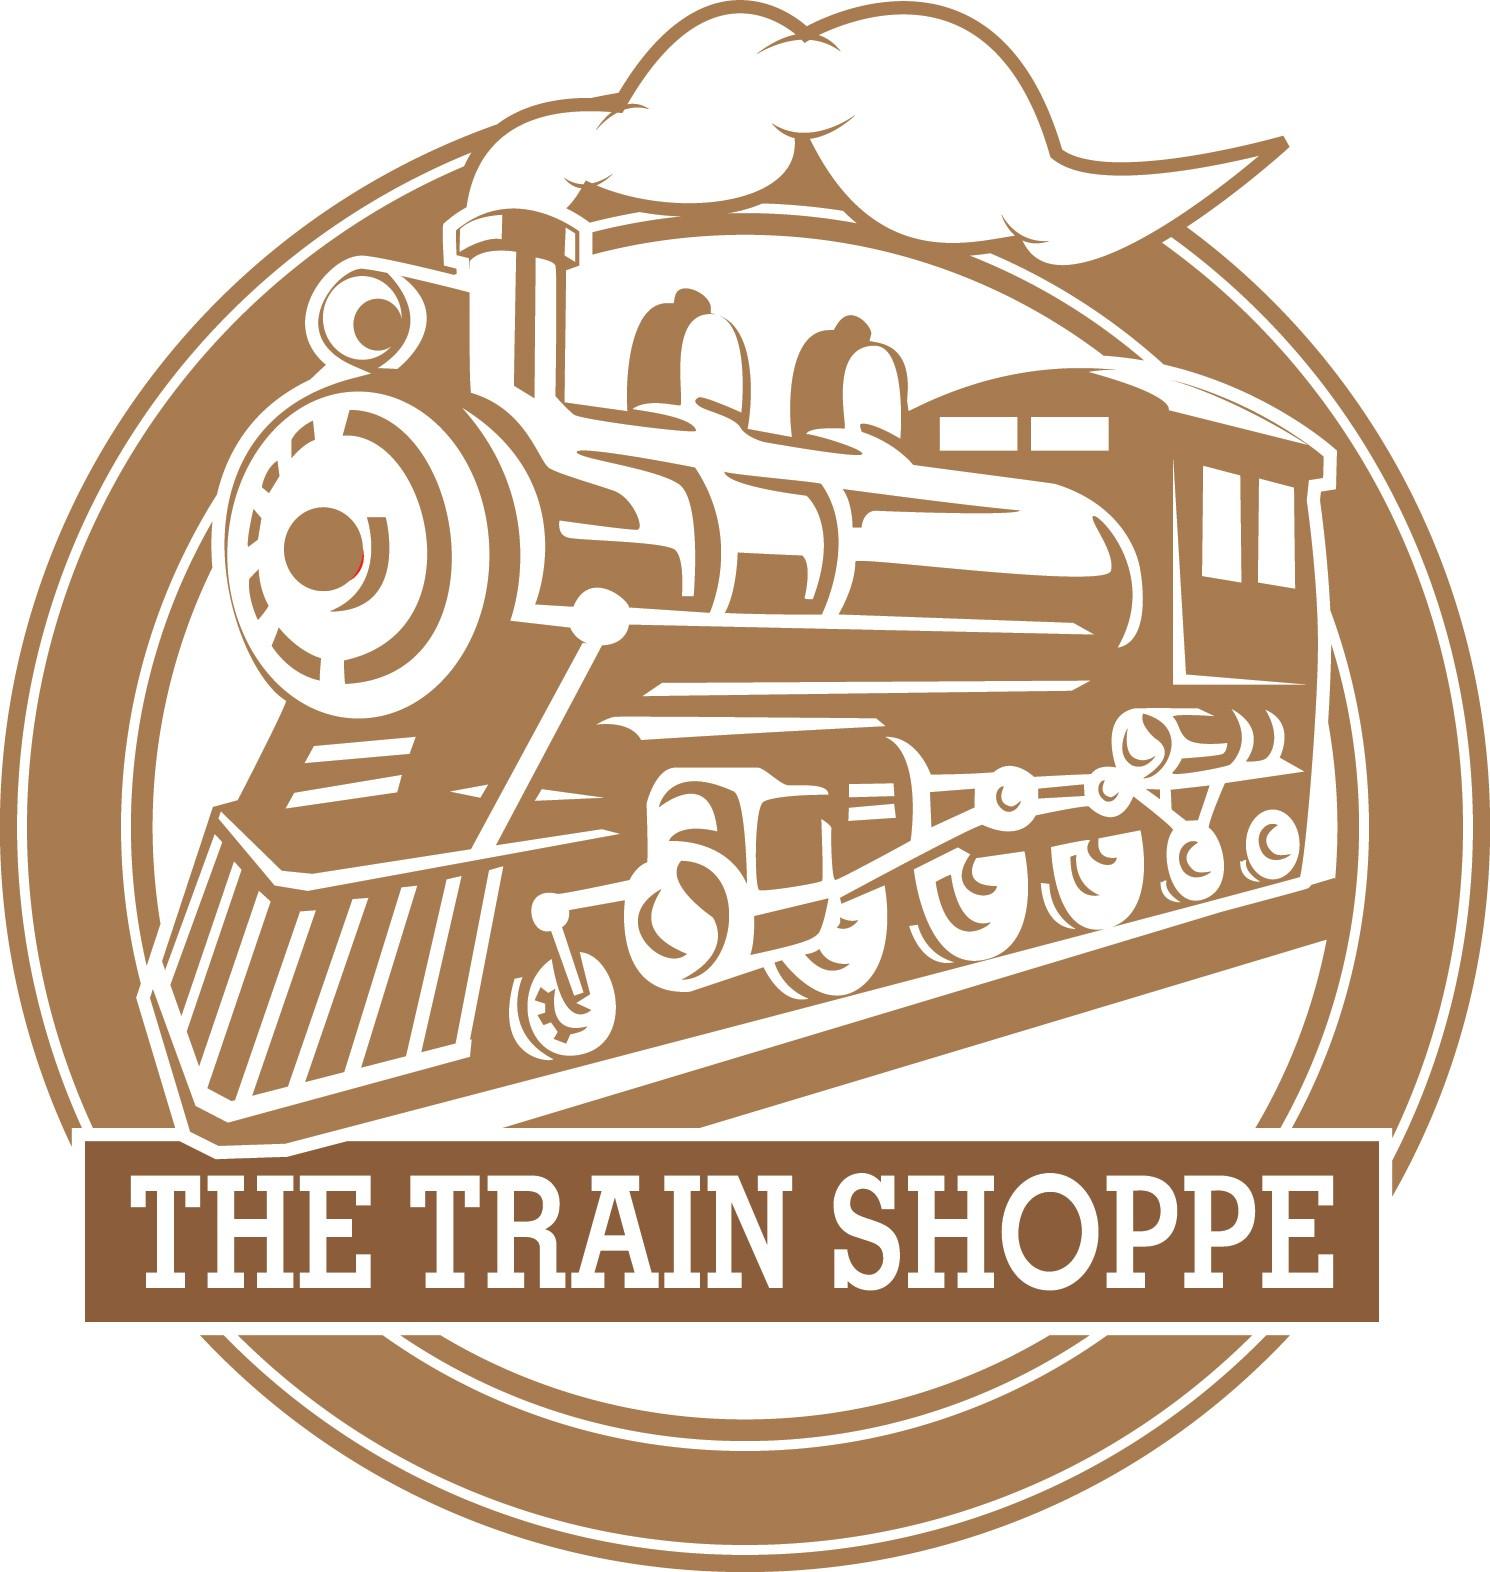 trainsoppe_logo.jpg